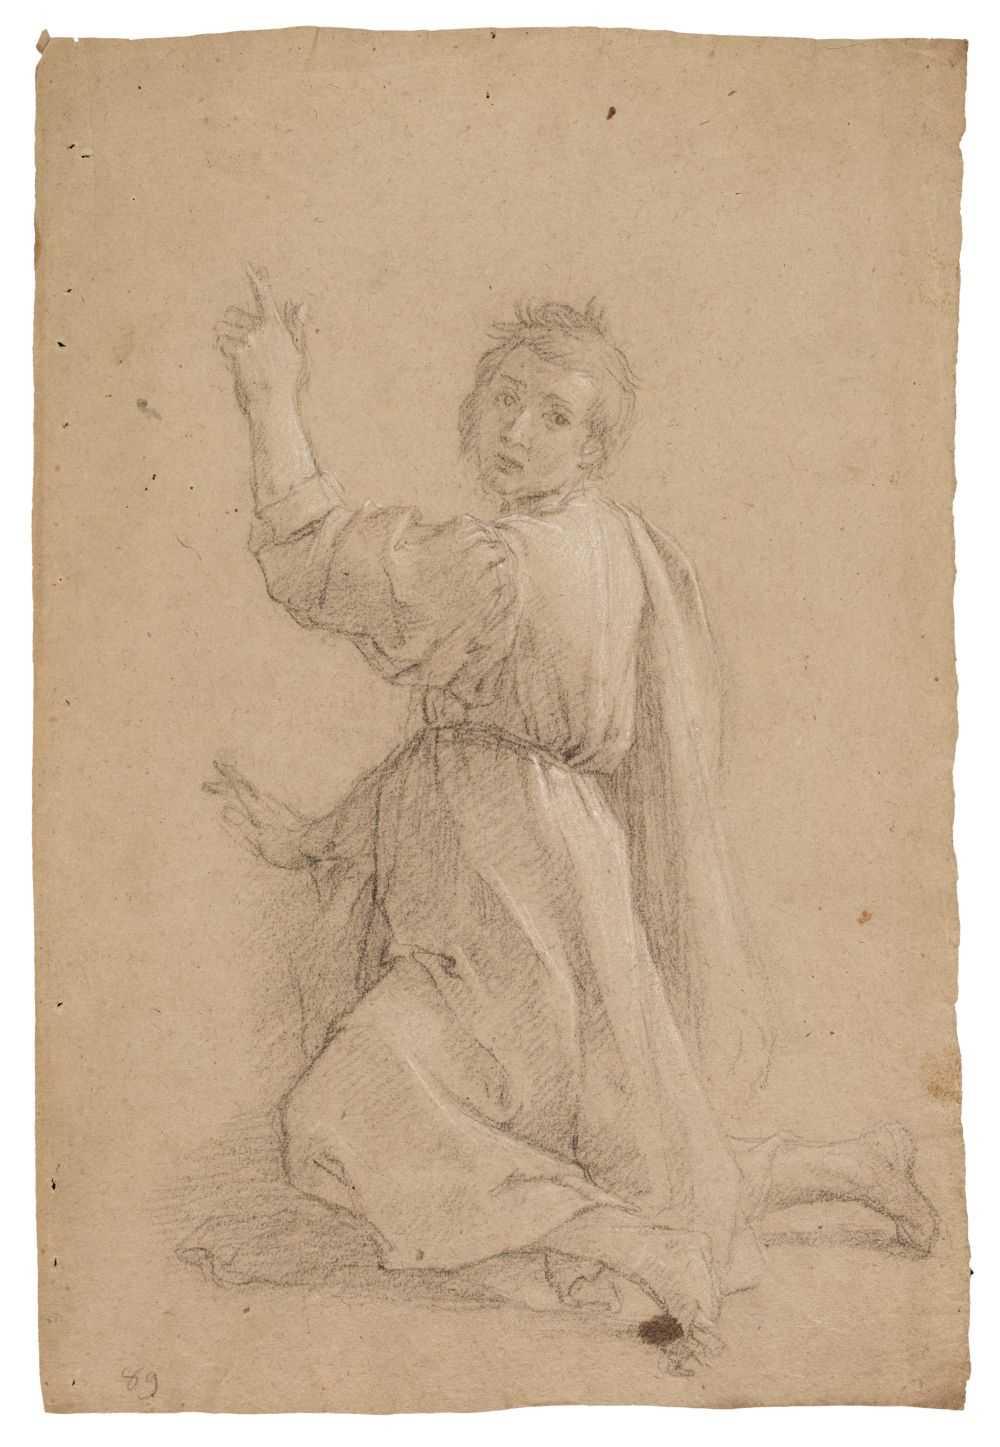 Lot 15 - Bernardi (Pietro, c. 1585/90-1623). A kneeling Saint and Mary Magdalene